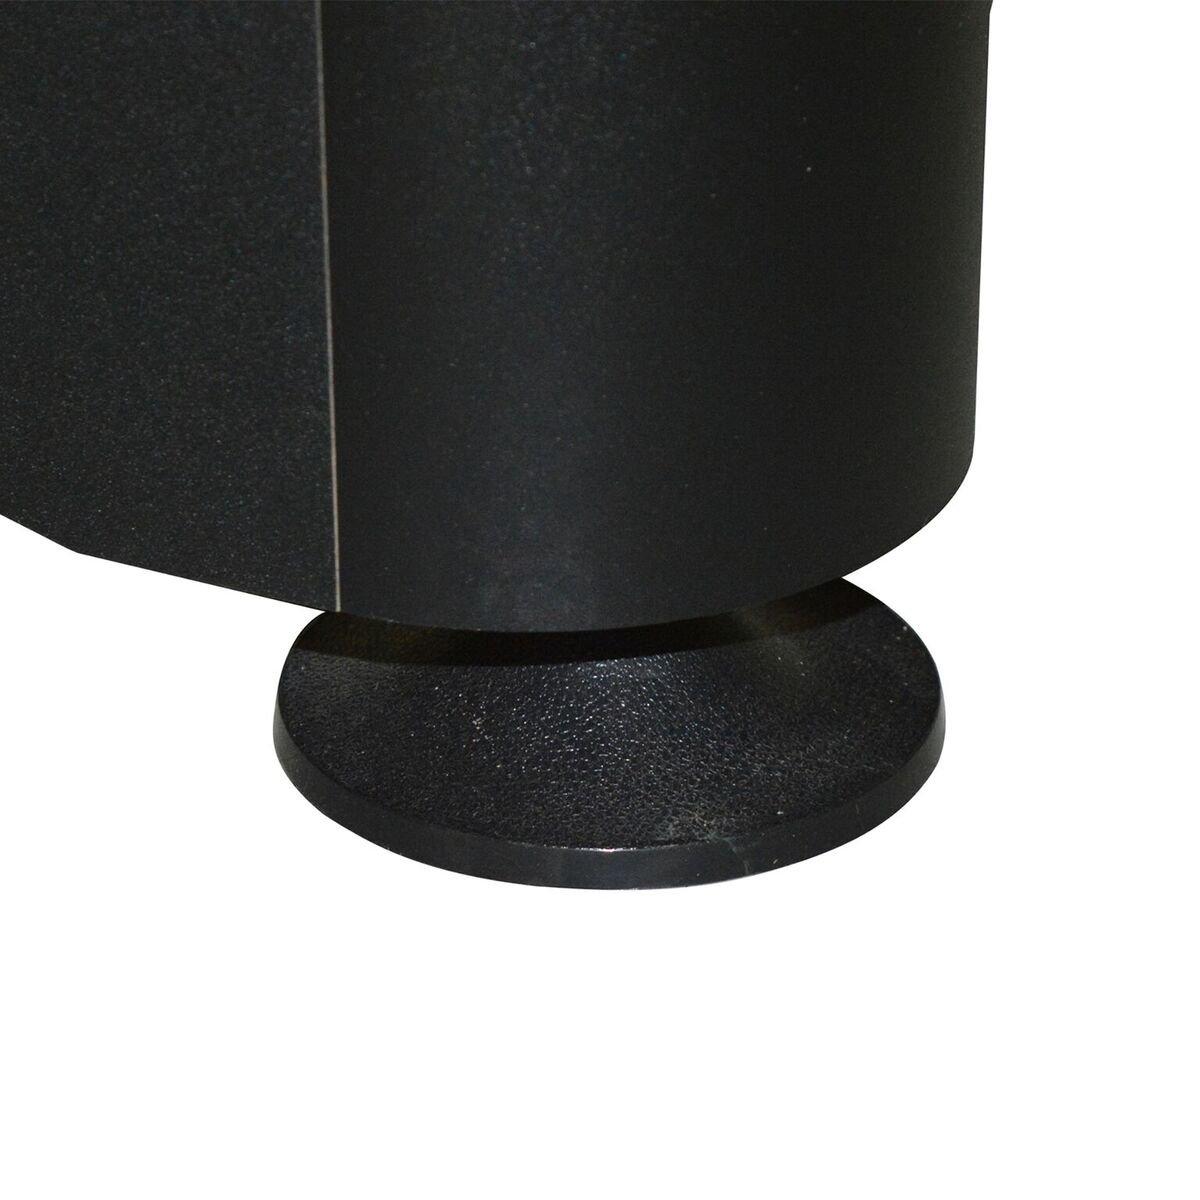 FamilyPoolFun.com Premium Black 7-ft Air Hockey Chrome Table w/5 Year Warranty from by FamilyPoolFun.com